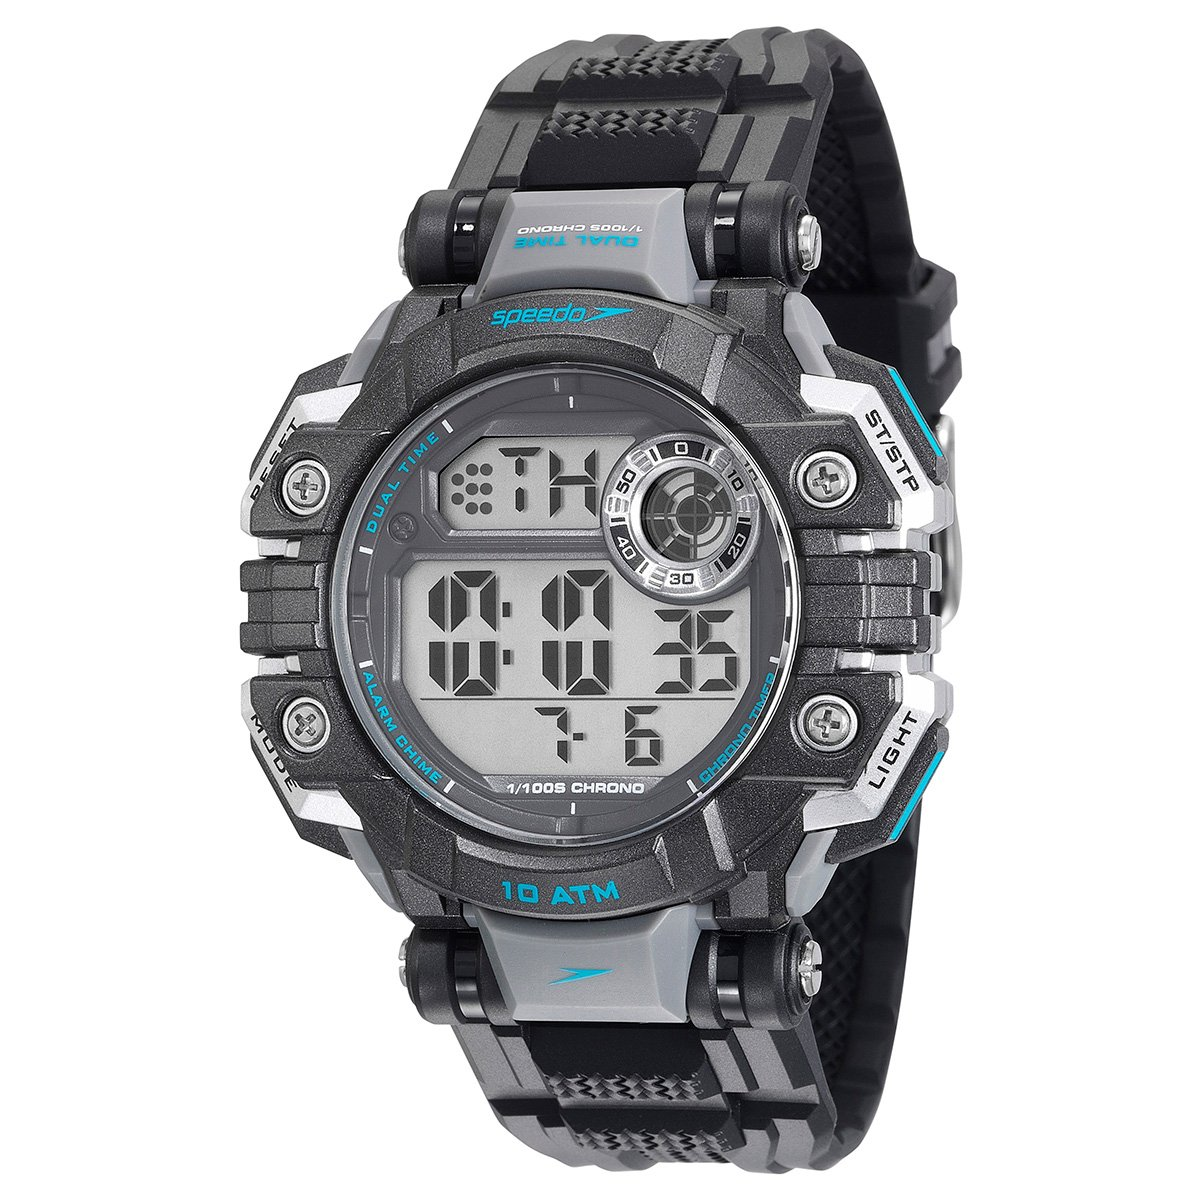 b8dbe079582 Relógio Masculino Digital Speedo 80624G0EVNP1 - Compre Agora